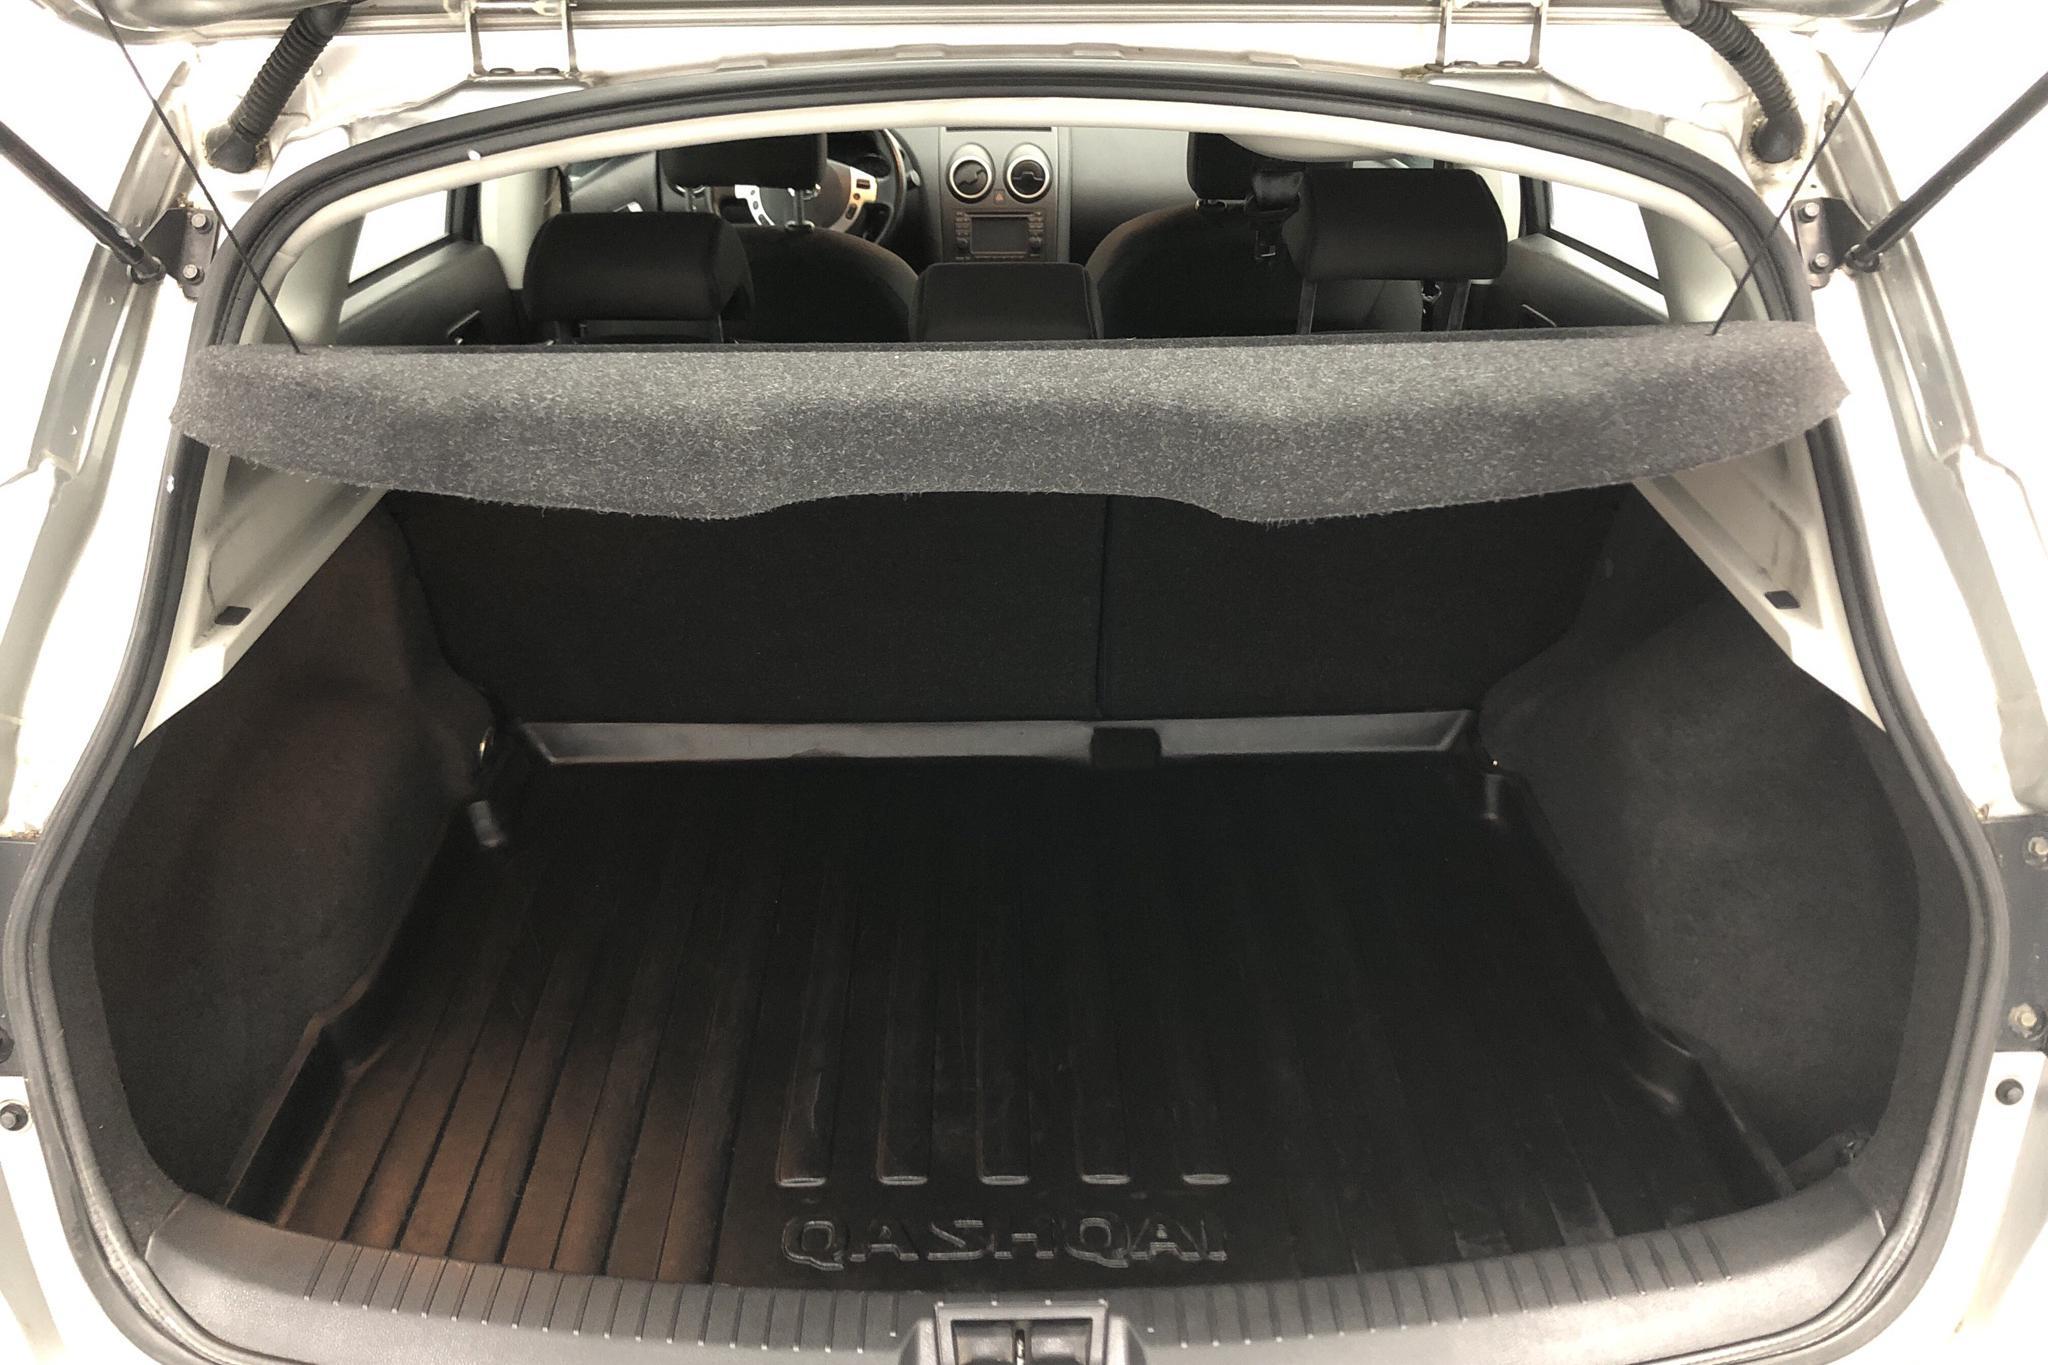 Nissan Qashqai 1.6 dCi (130hk) - 176 970 km - Manual - silver - 2012